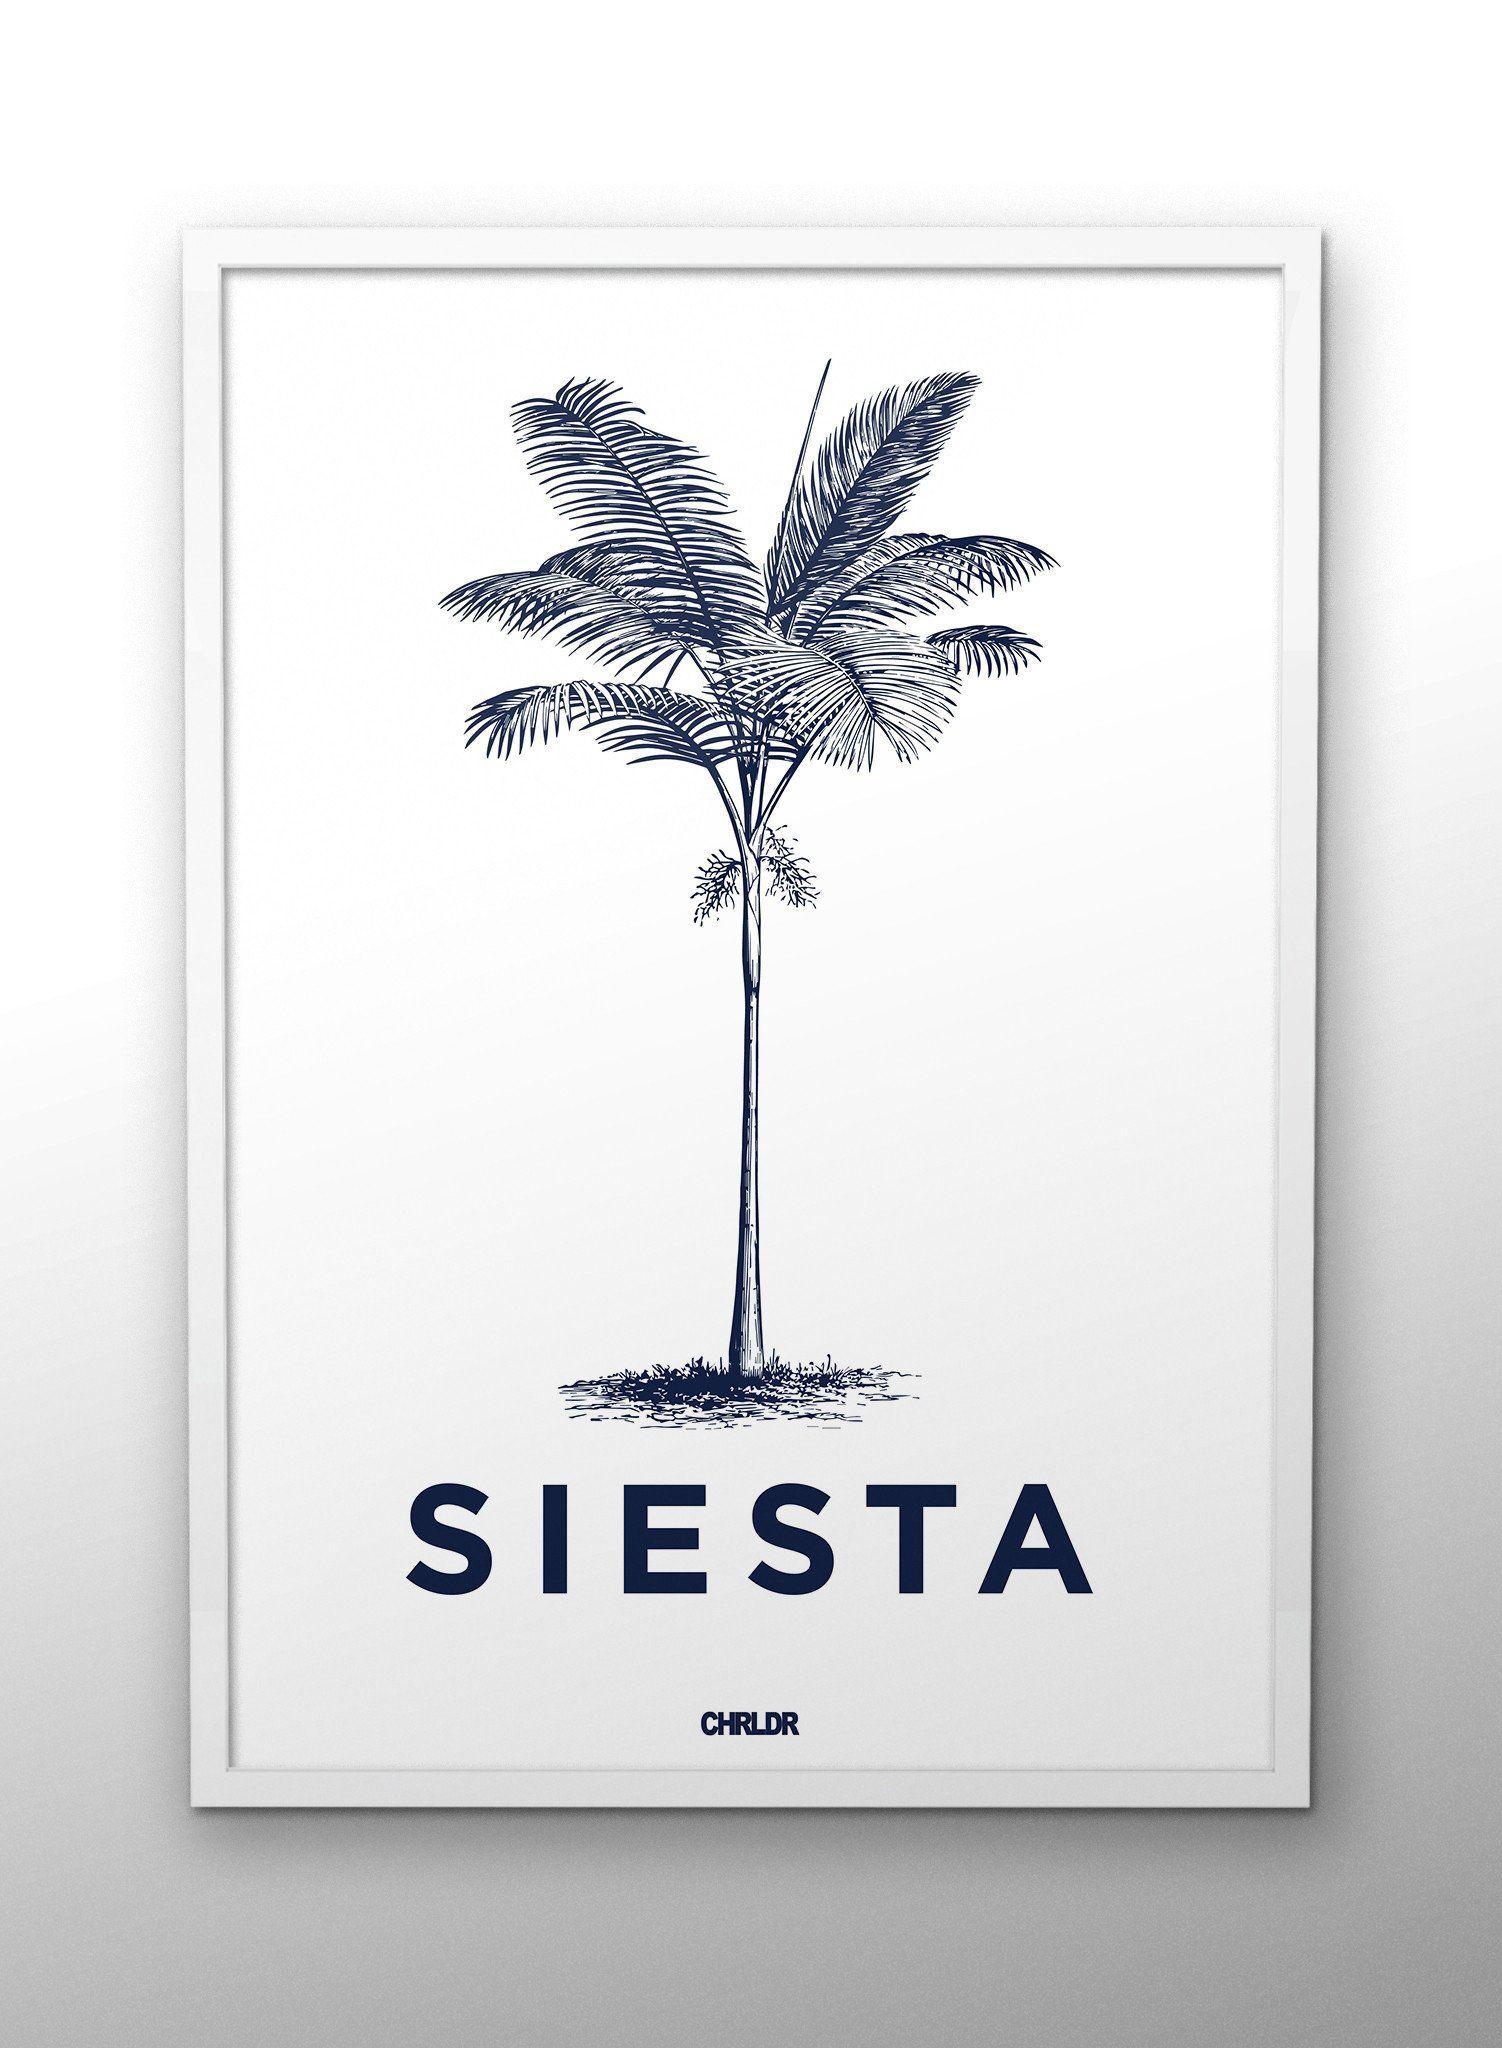 Siesta\